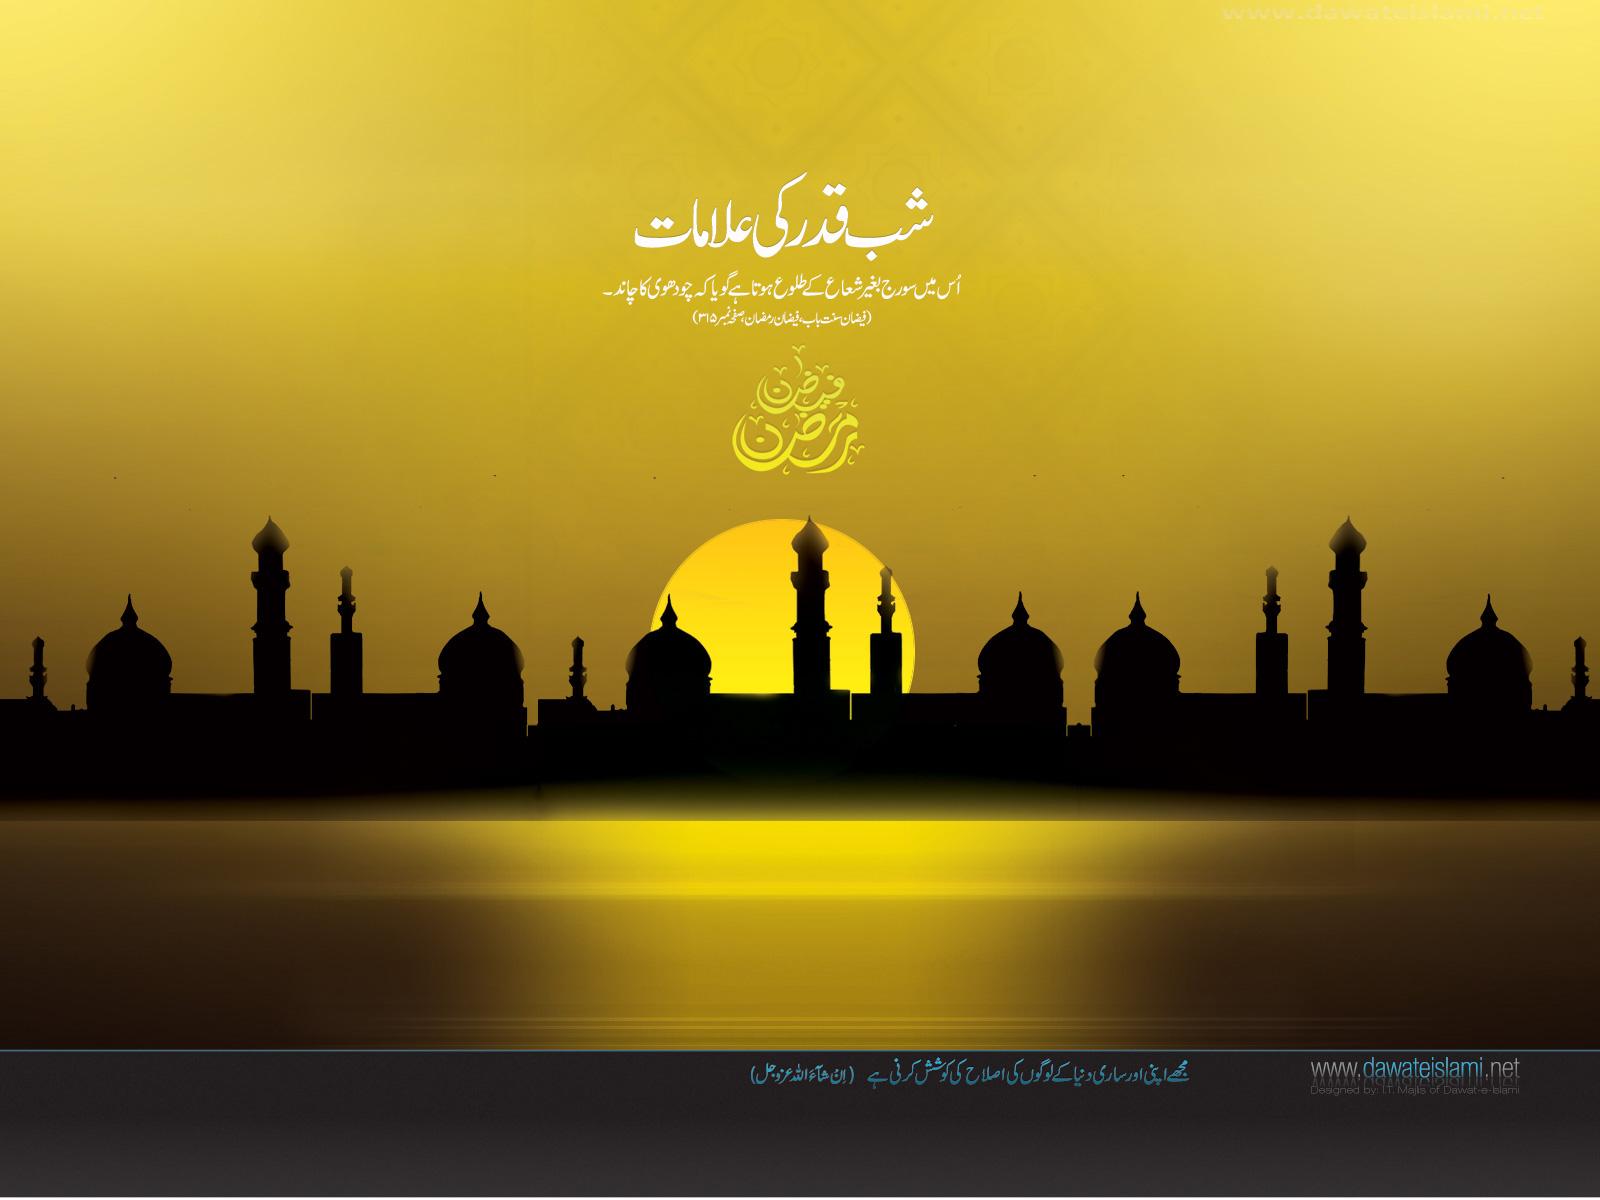 Love Quotes Hd Wallpapers For Him Islami Wallpaper Ramadan Wallpapers